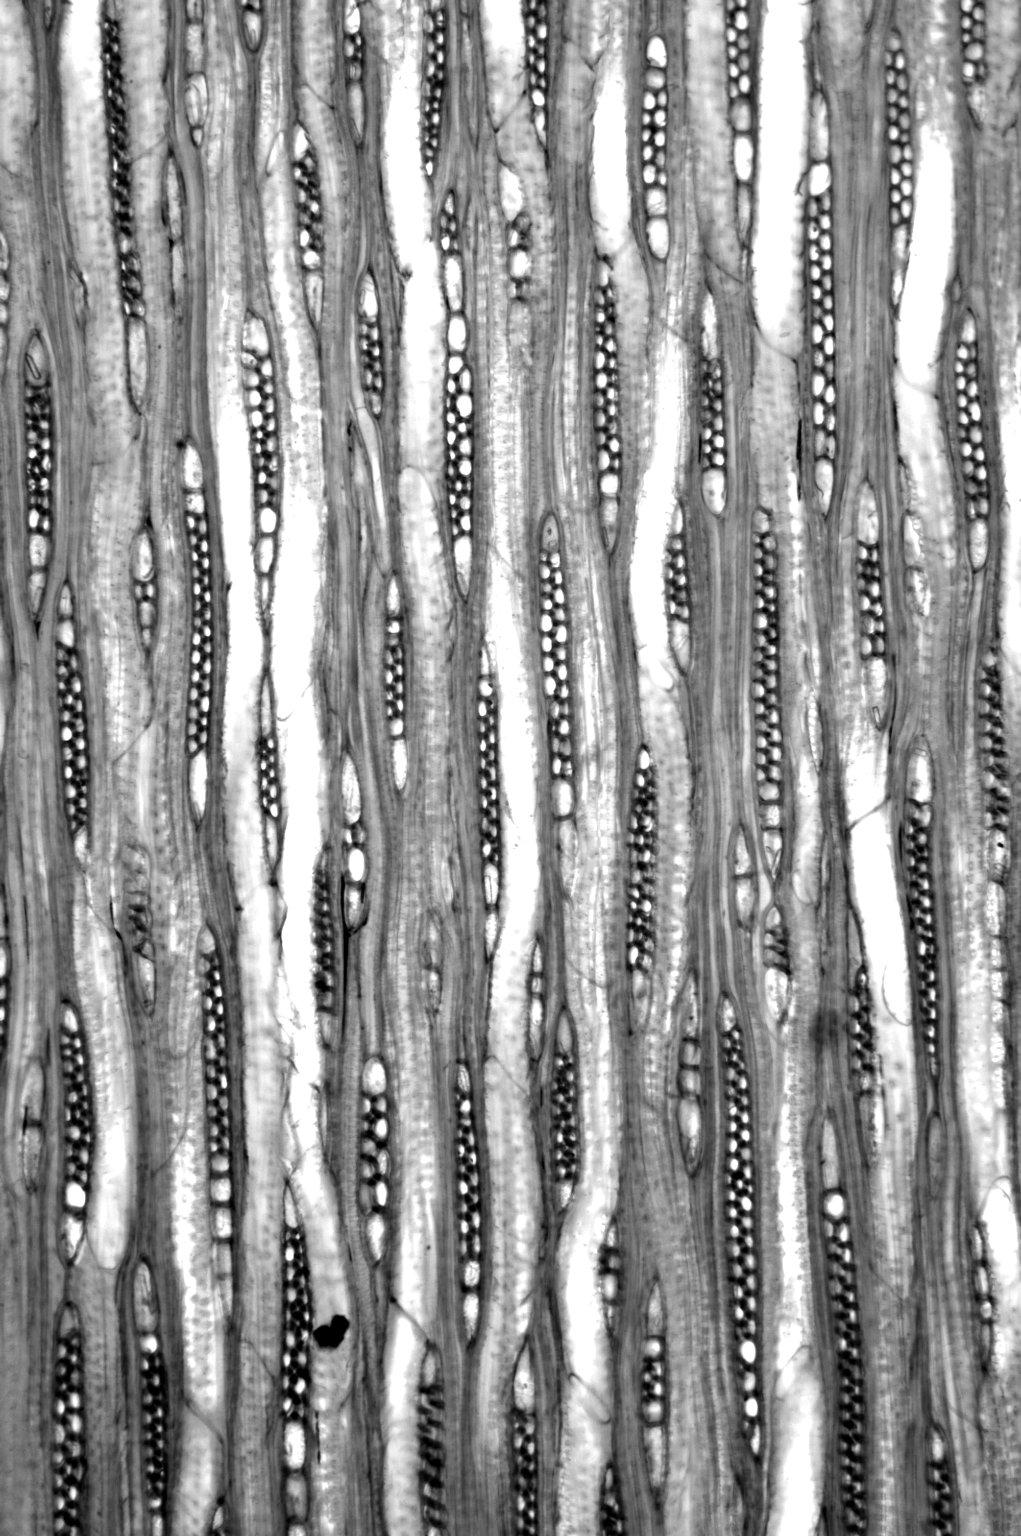 OLEACEAE Ligustrum lucidum